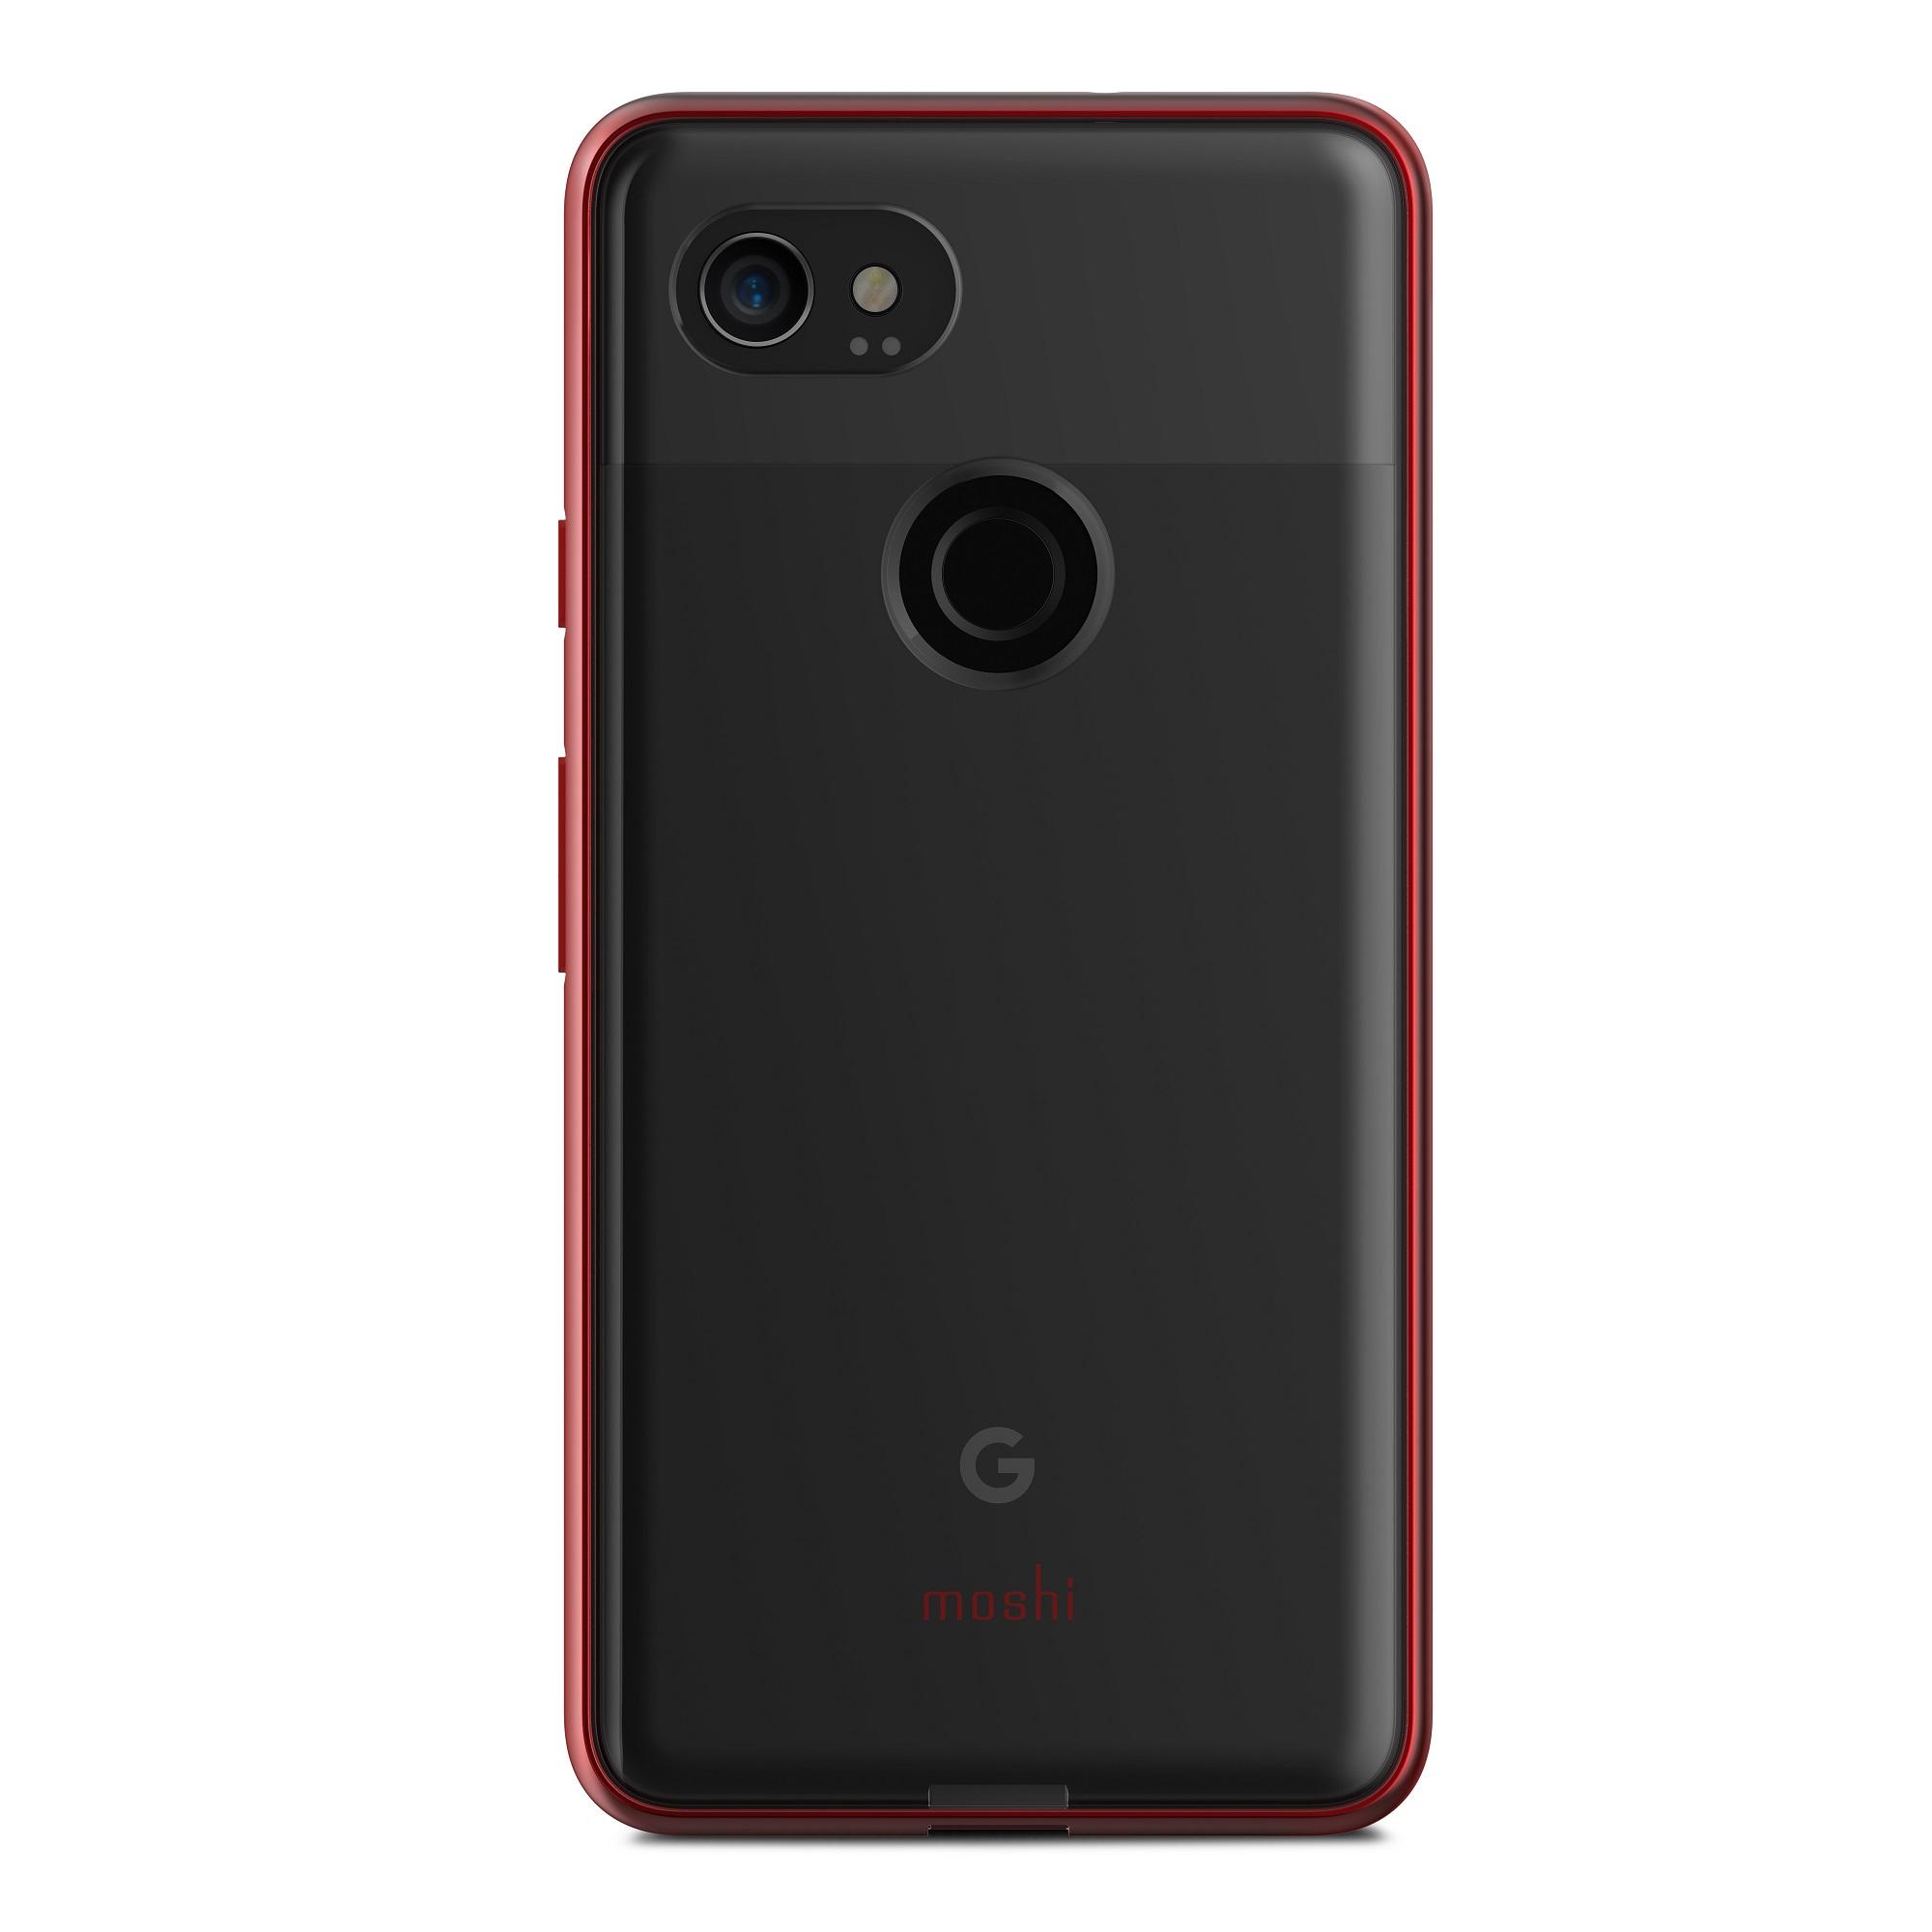 Moshi Vitros Case for Google Pixel 2 XL